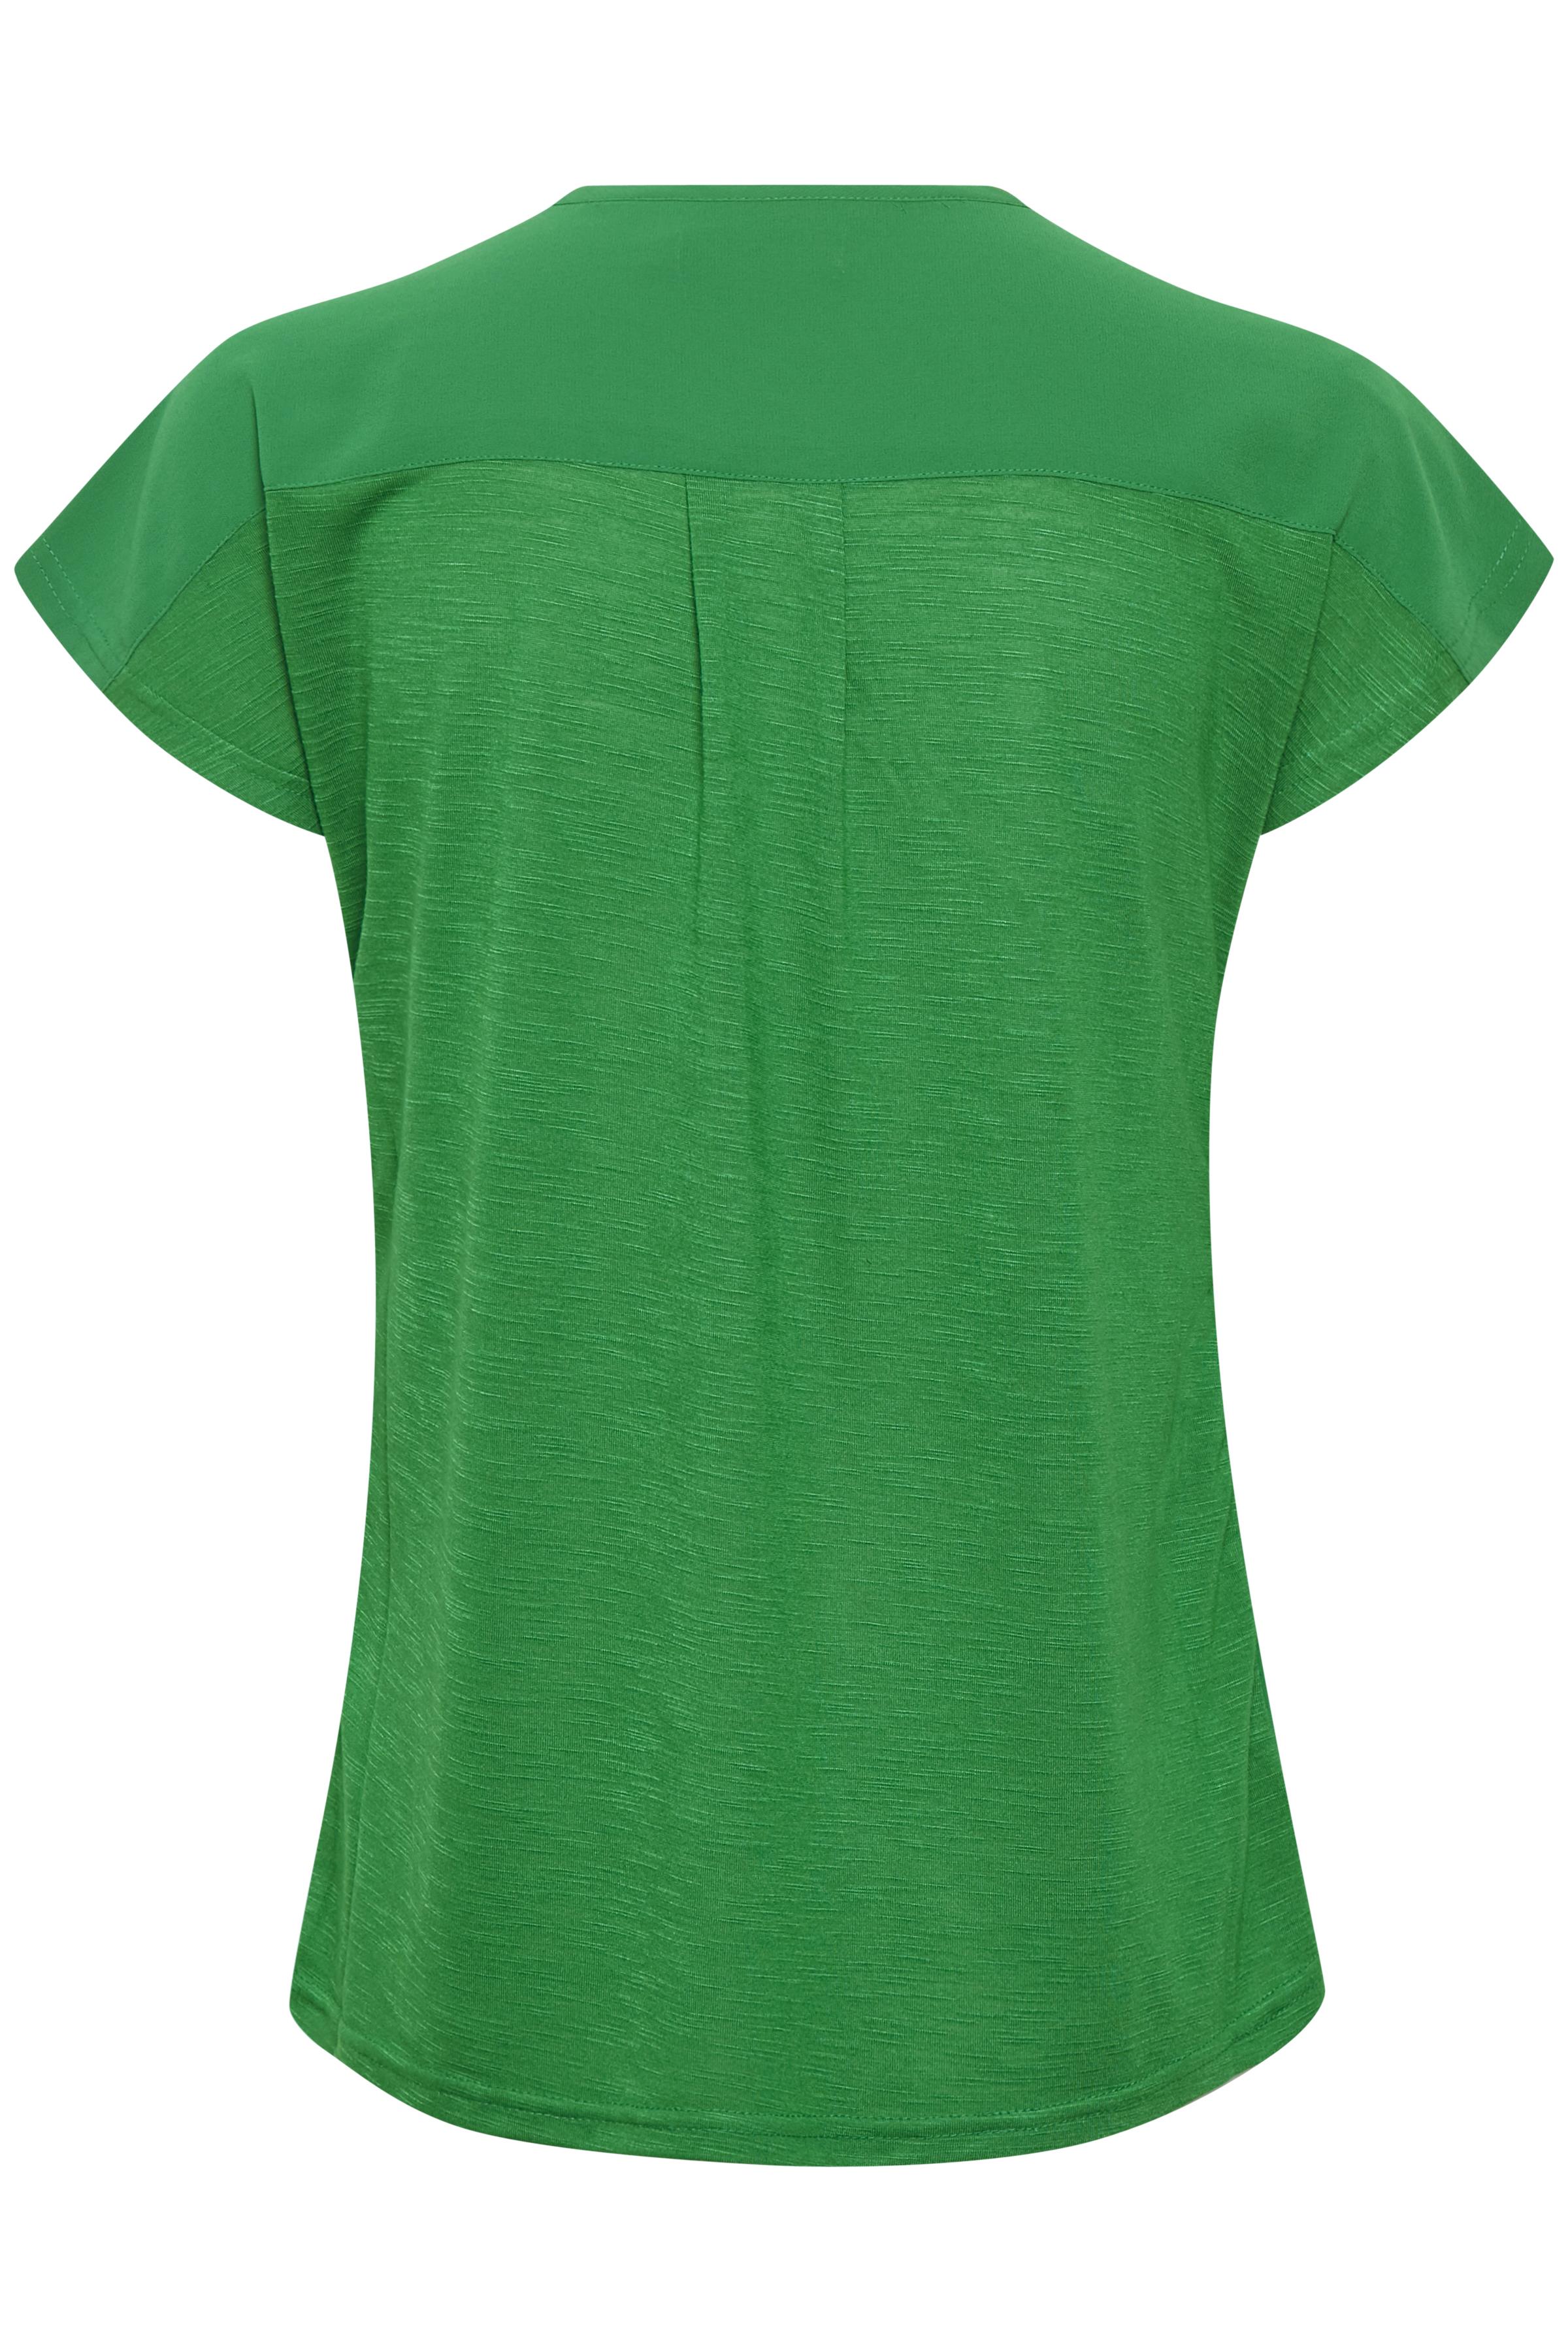 Grün Kurzarm-Bluse von Fransa – Shoppen Sie Grün Kurzarm-Bluse ab Gr. XS-XXL hier